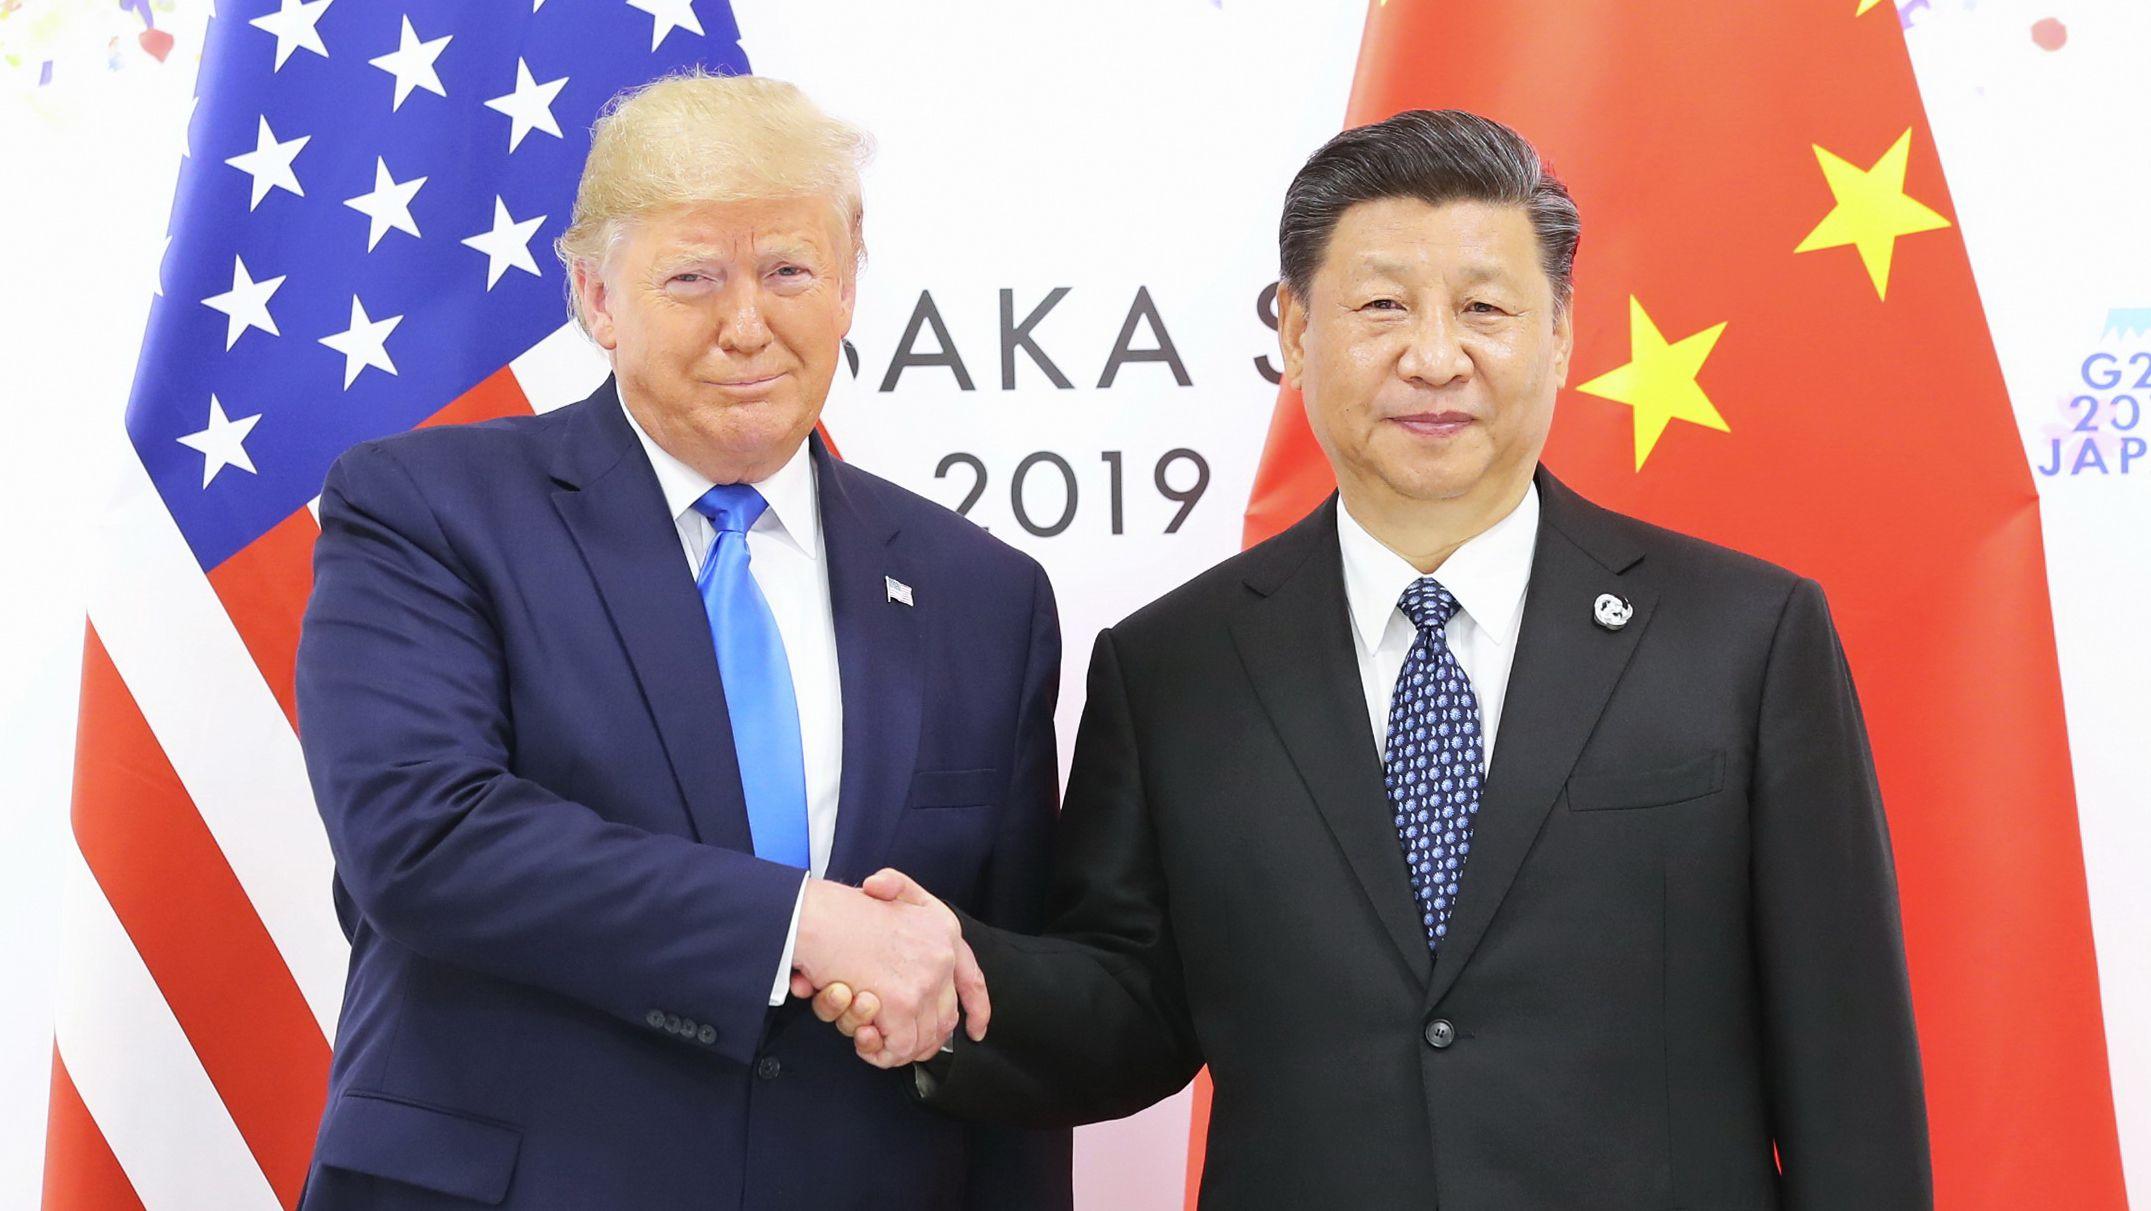 Donald Trump und Xi Yinping in Osaka